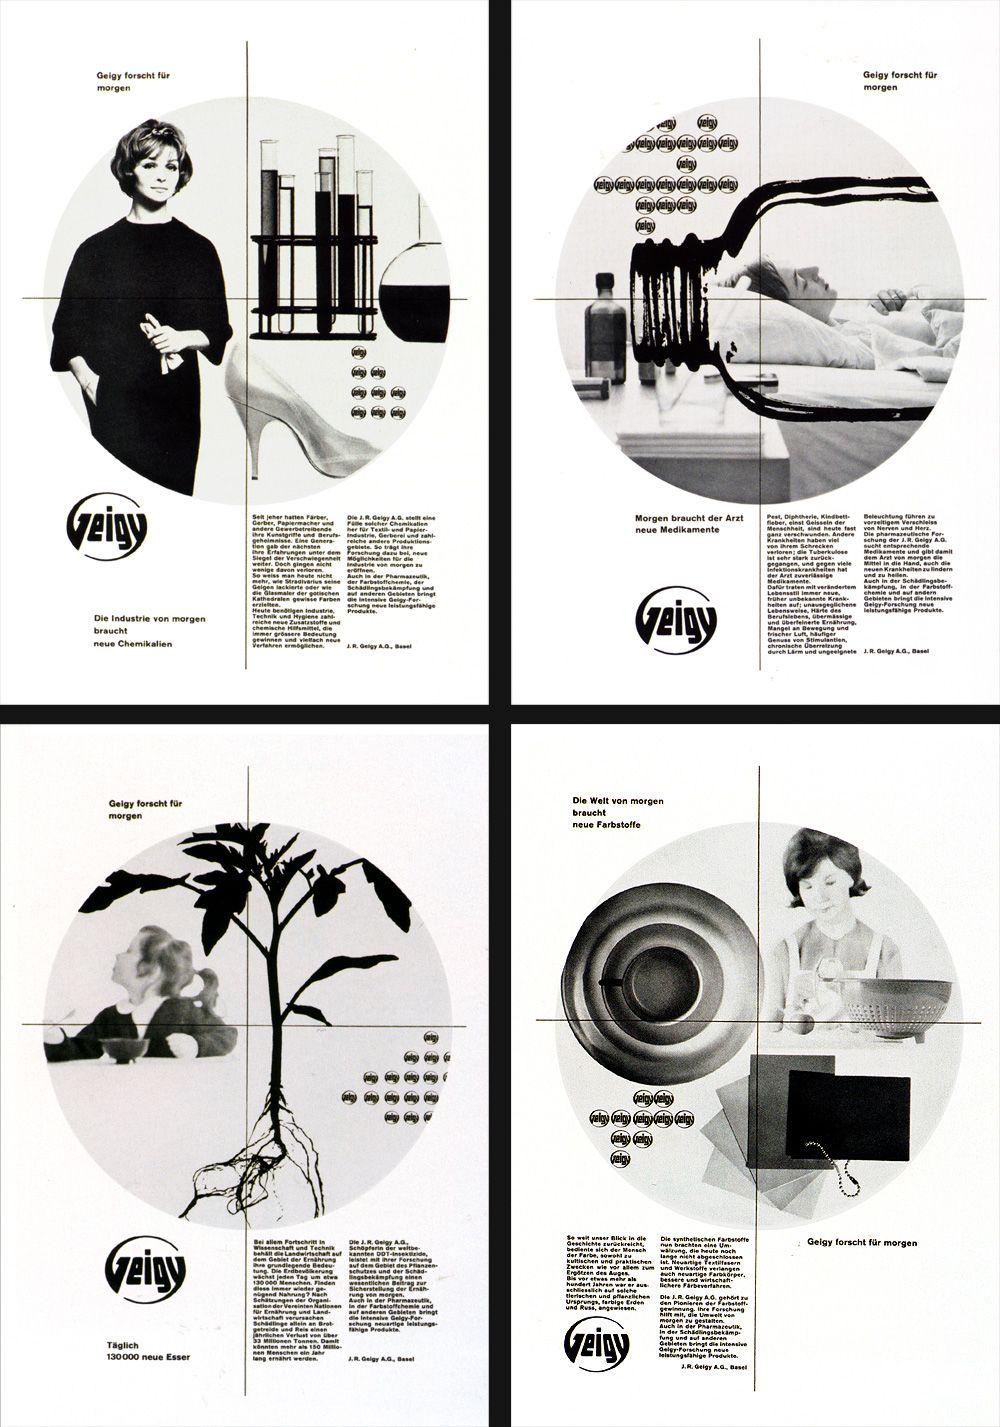 Advertising-Infographics-Geigy Advertising Infographics : Geigy